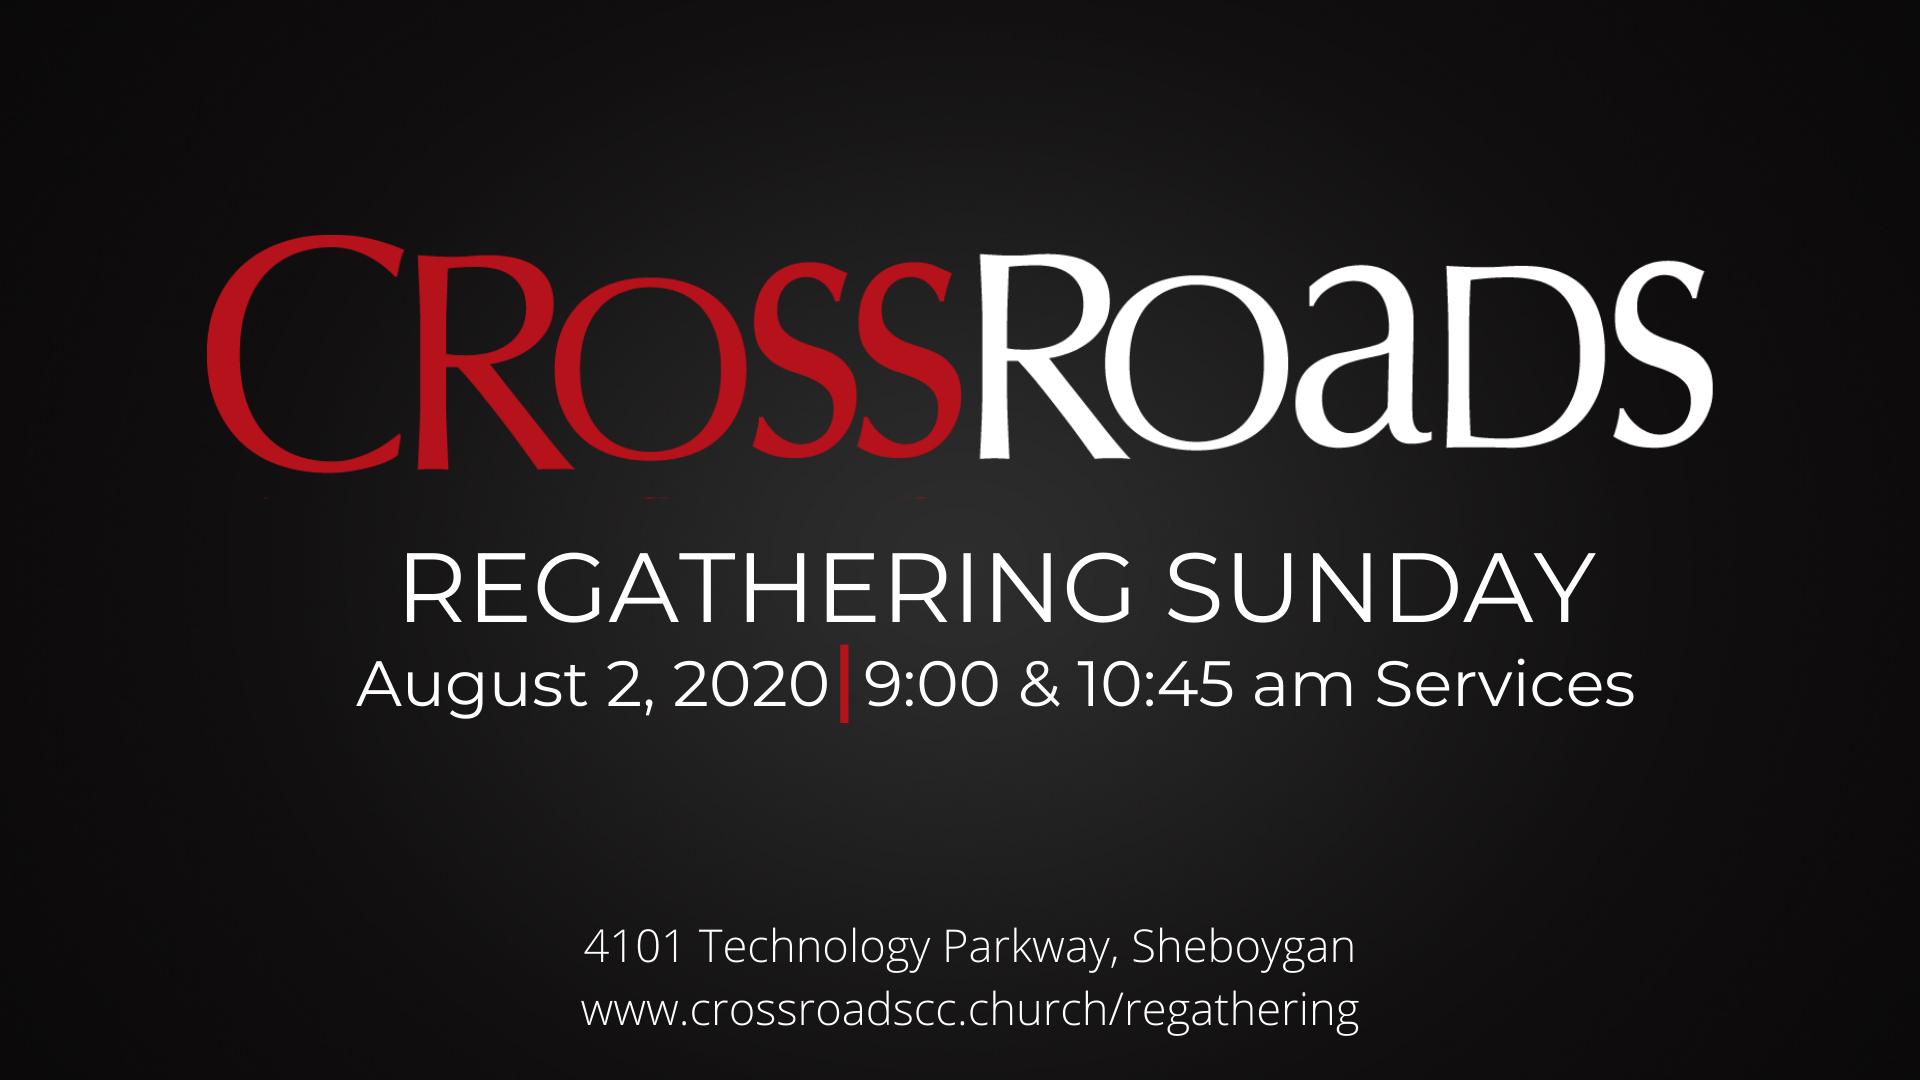 Regathering Sunday Pop Up Image